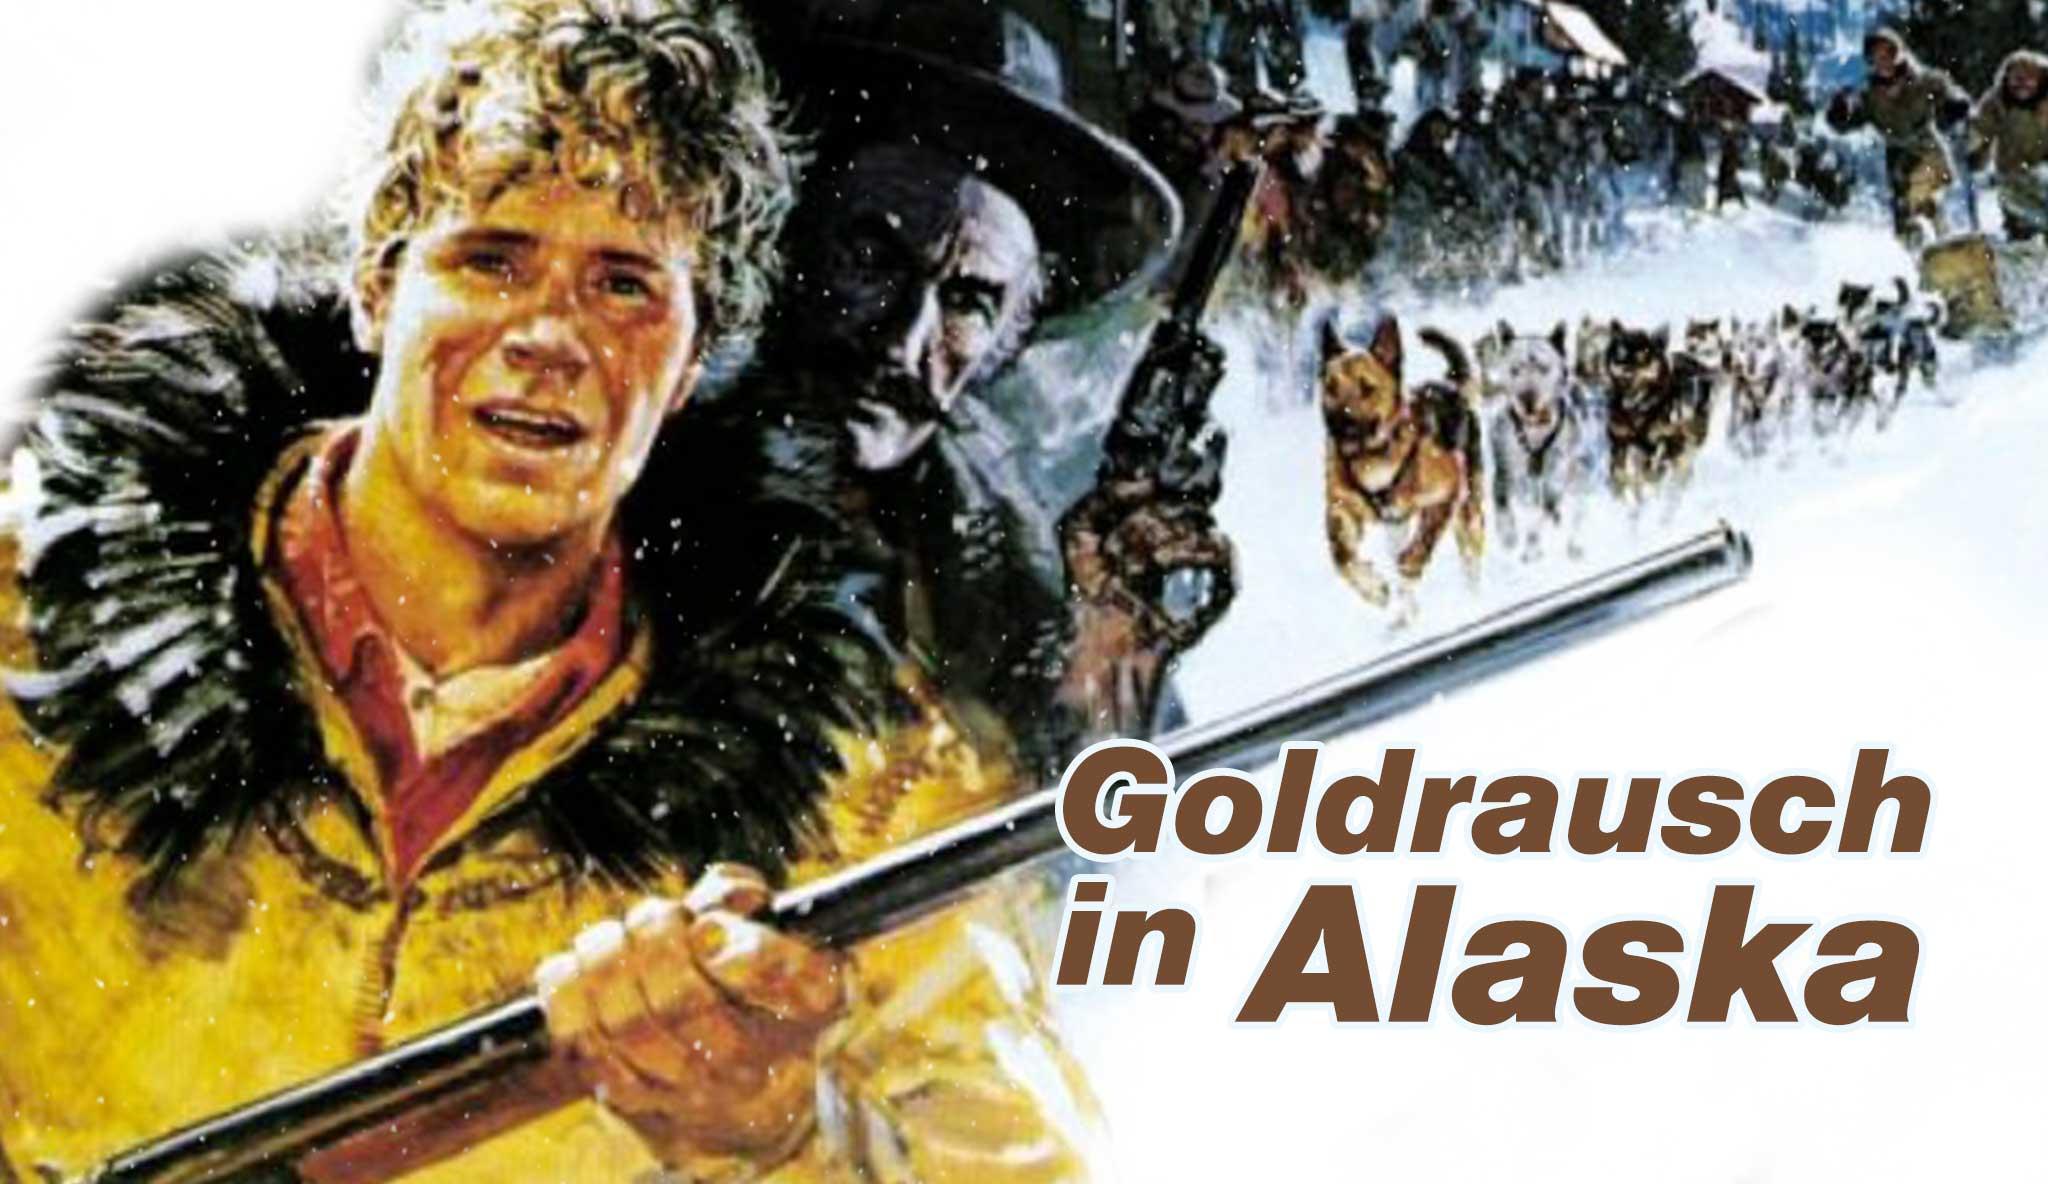 goldrausch-in-alaska\header.jpg